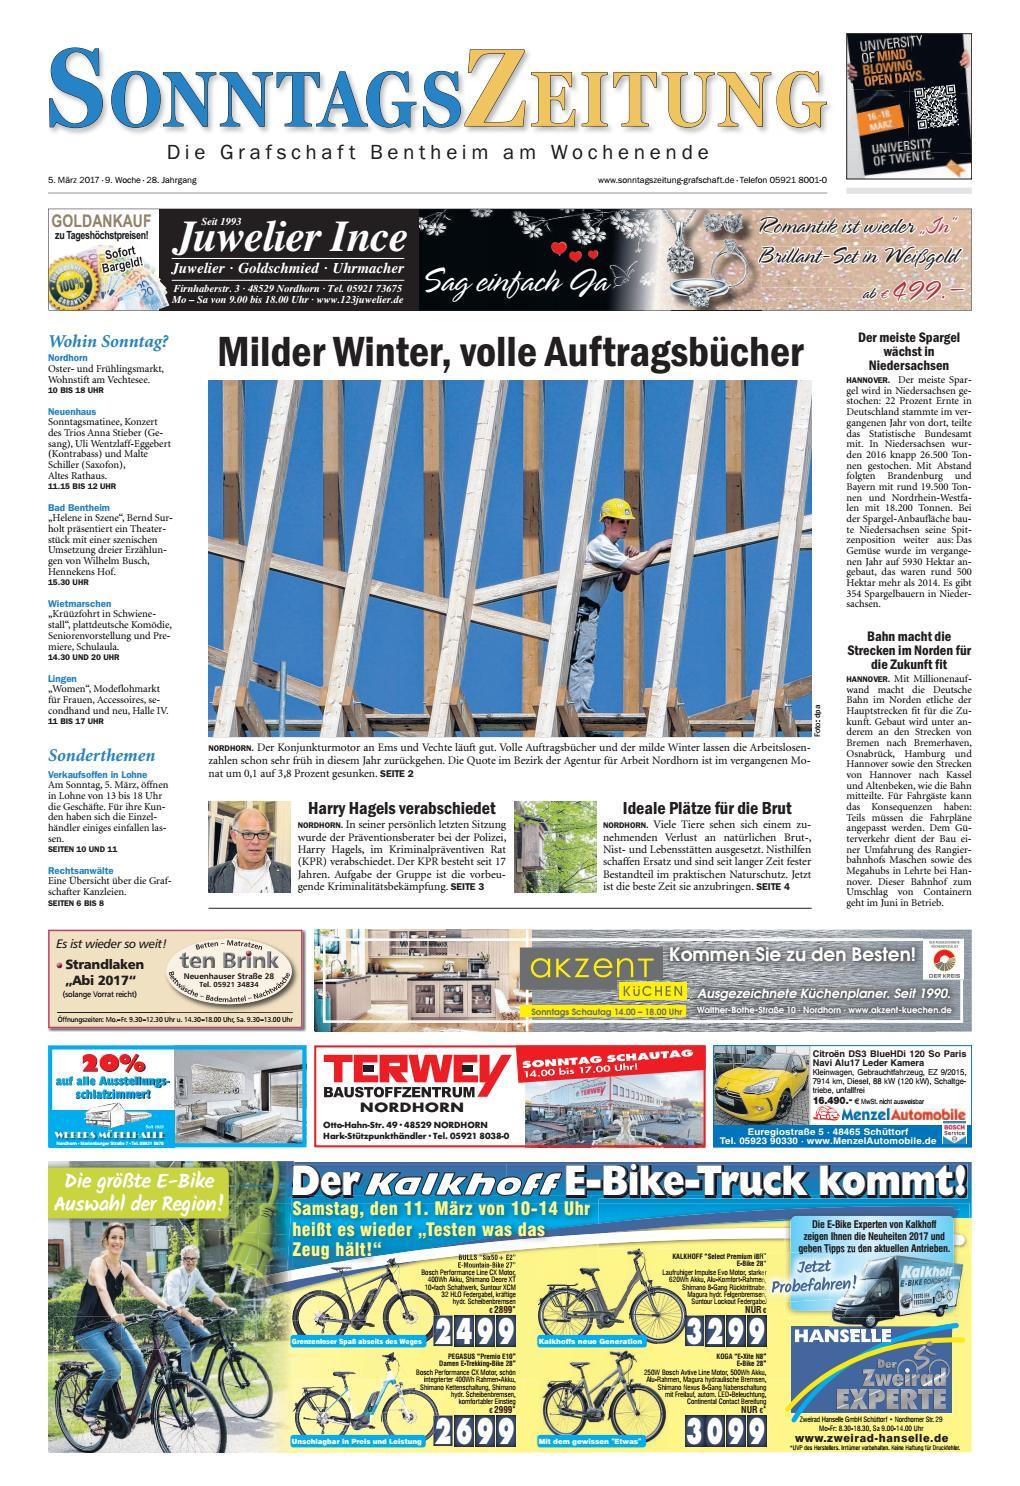 sonntagszeitung 05 03 2017 by sonntagszeitung issuu. Black Bedroom Furniture Sets. Home Design Ideas